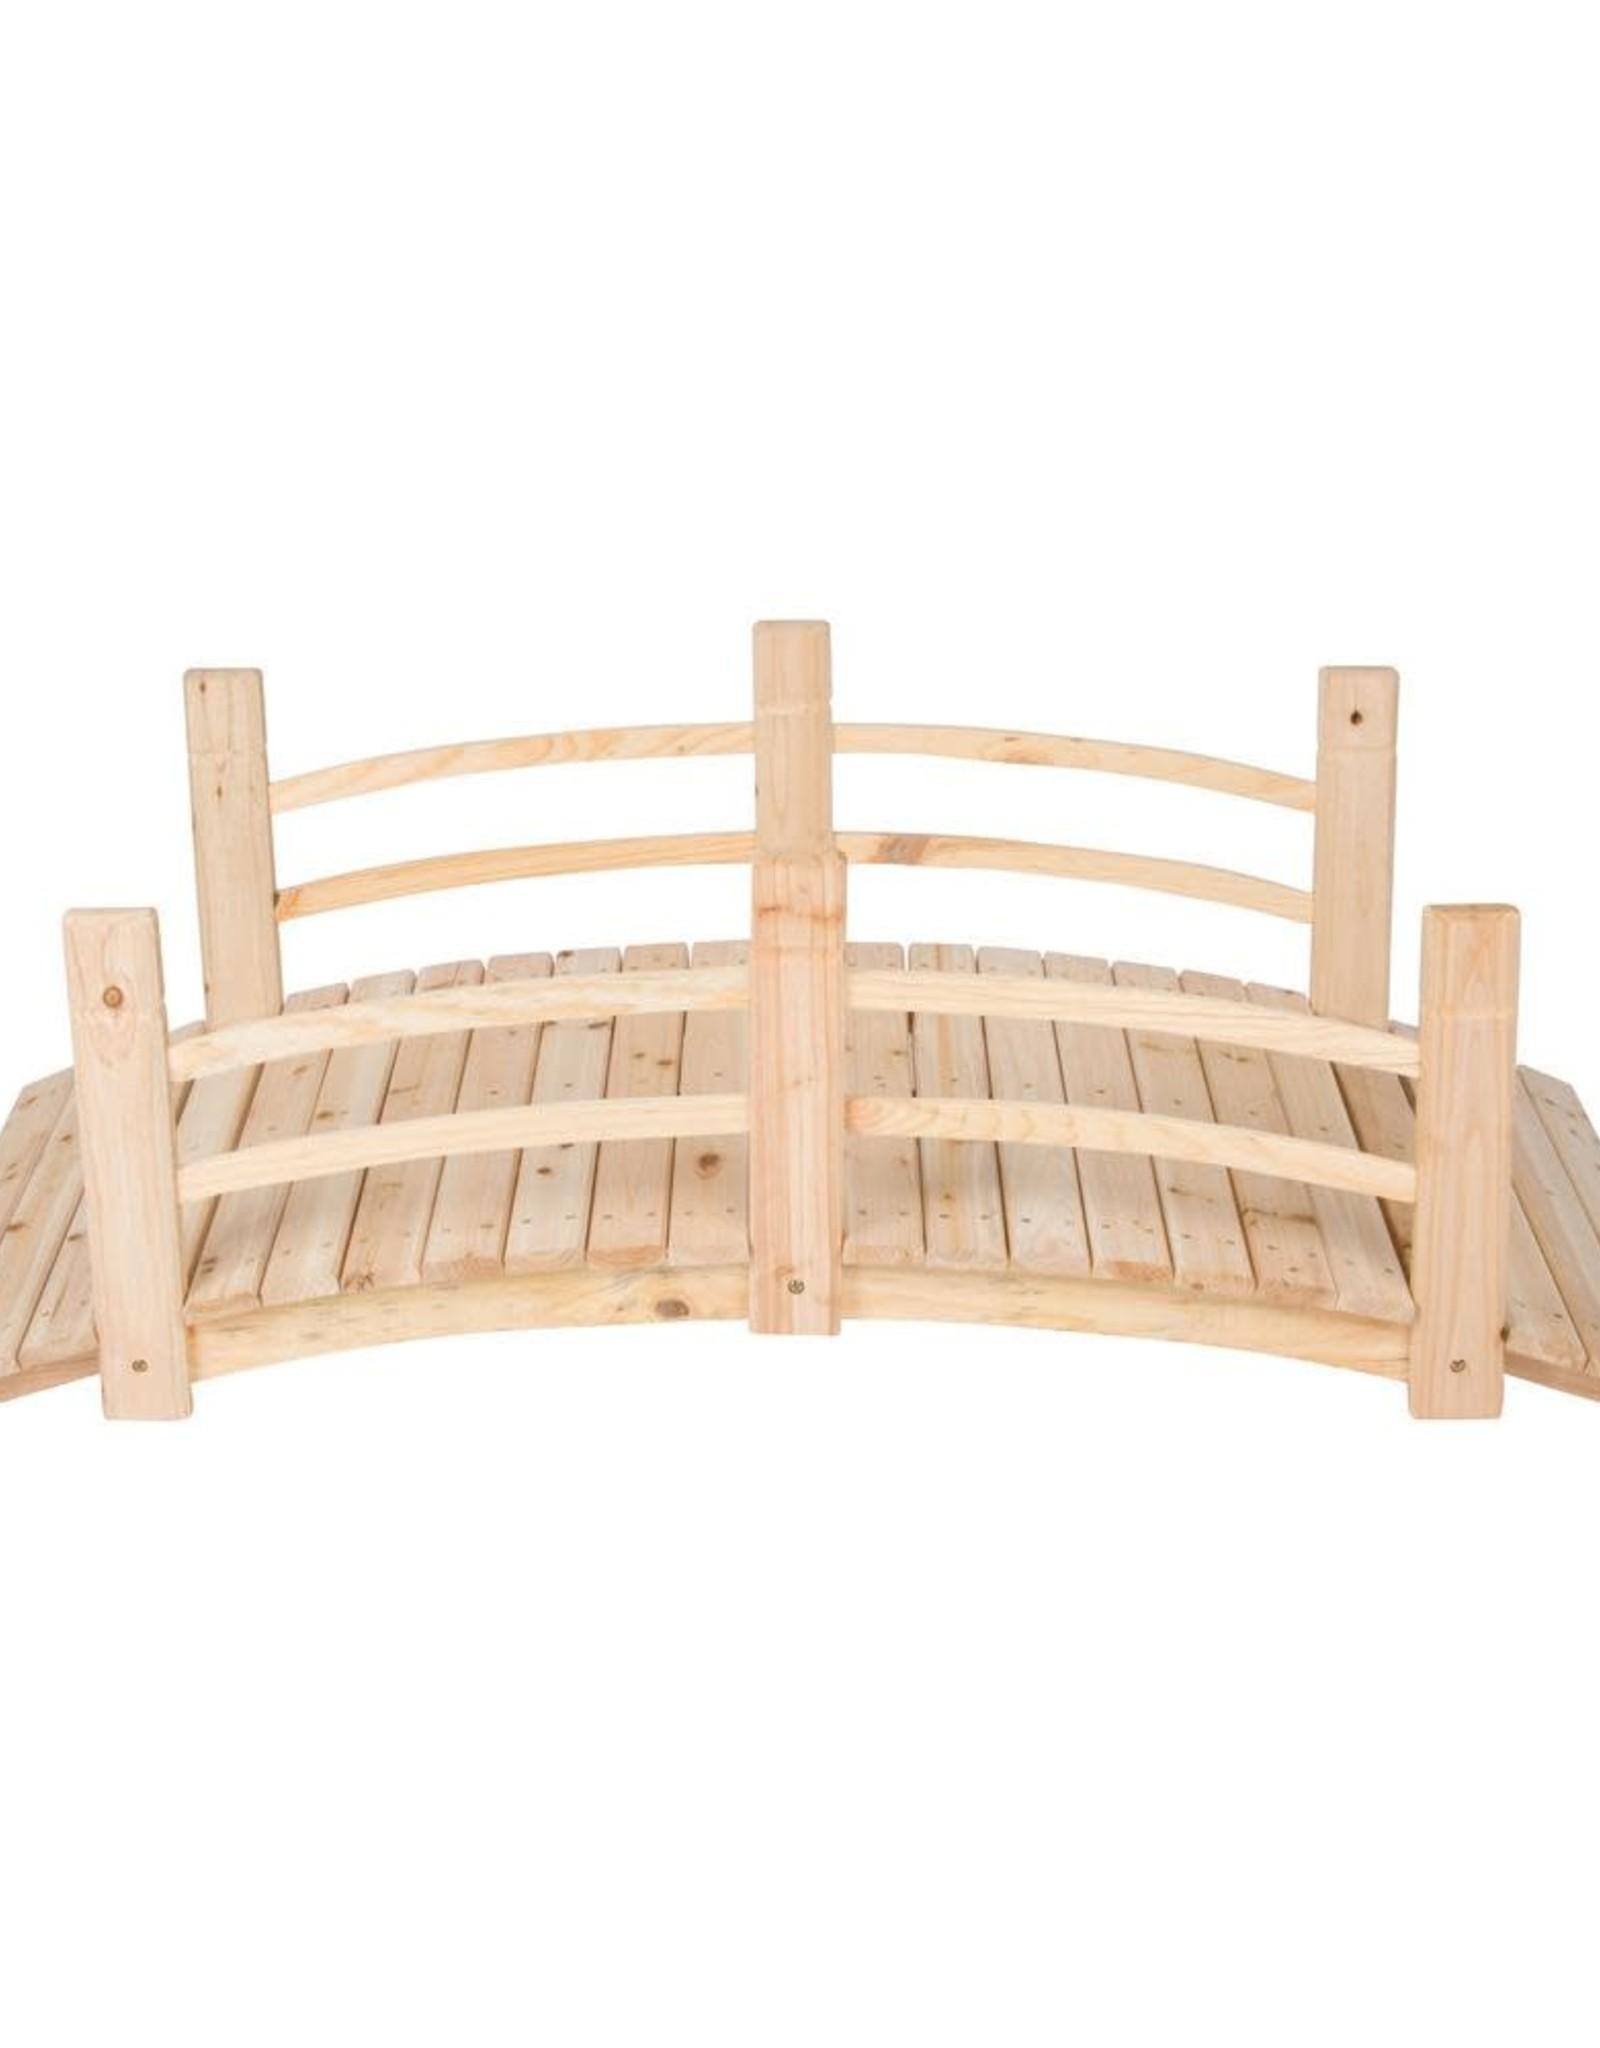 Shine Company 5 ft. Natural Cedar Wood Garden Bridge